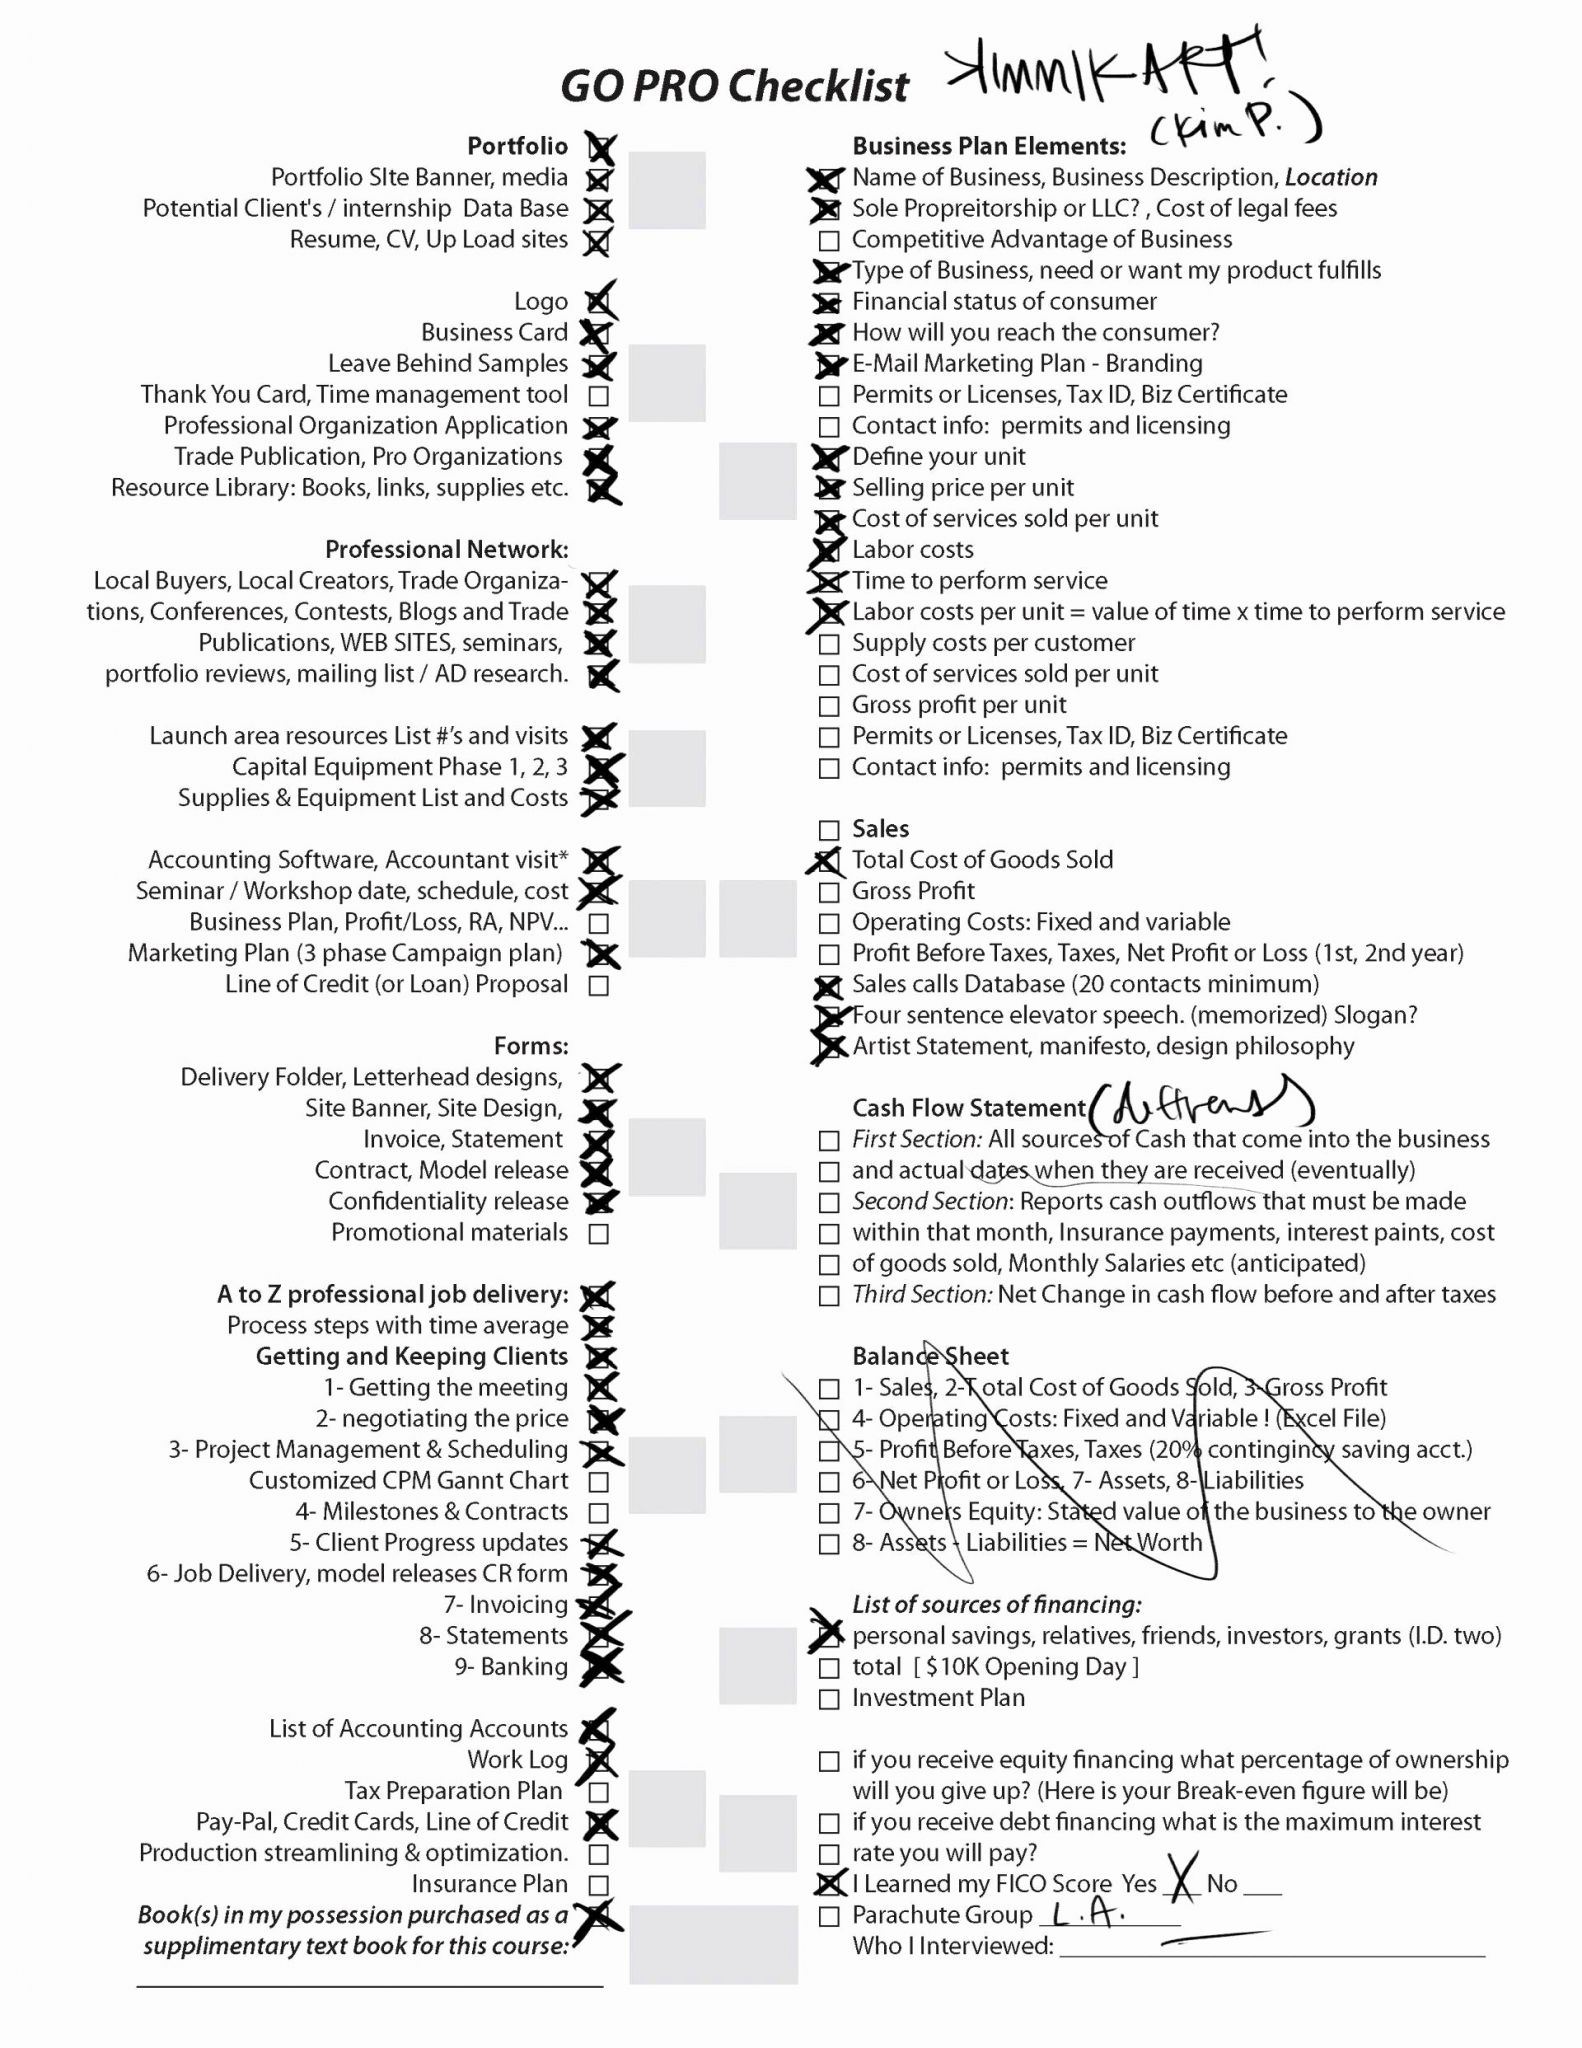 Permit Tracking Spreadsheet